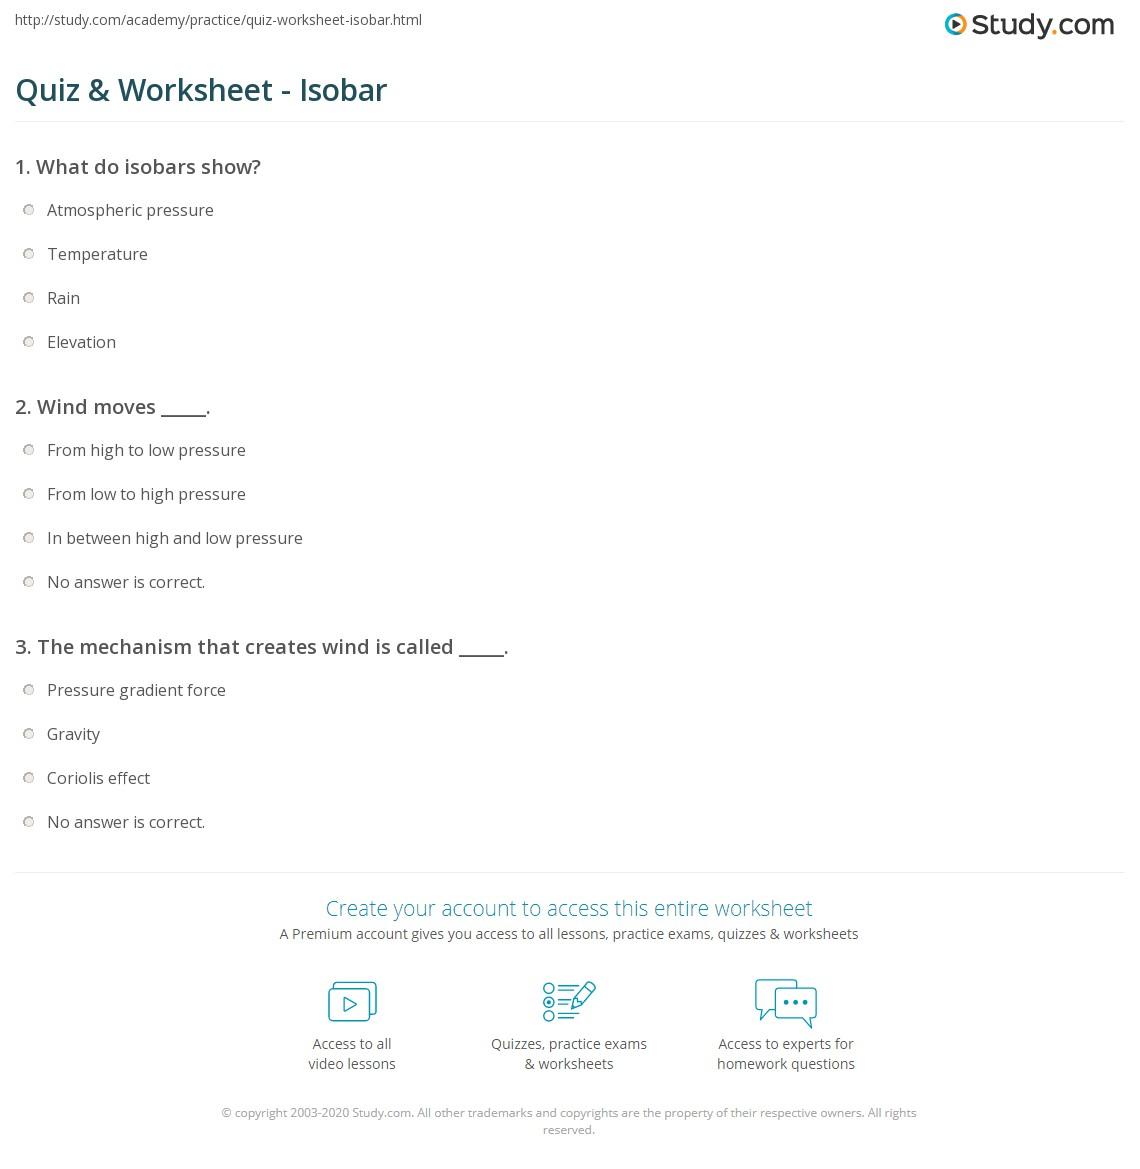 Quiz & Worksheet - Isobar | Study.com